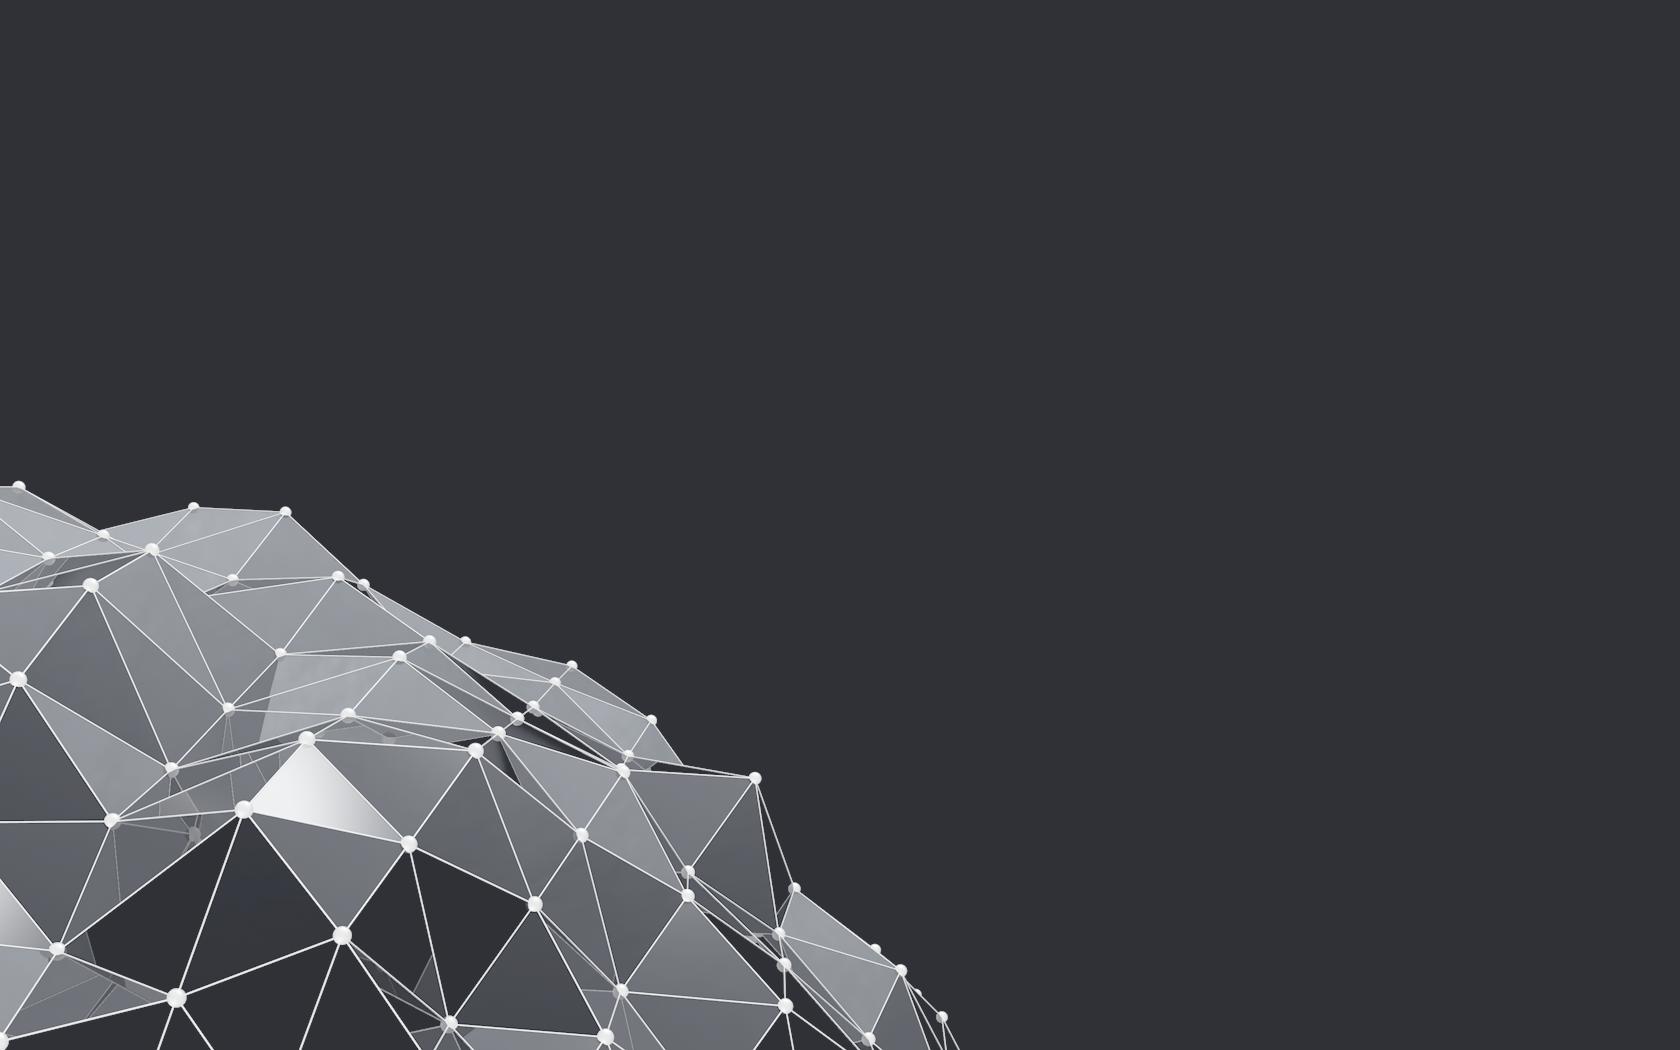 A Wallpaper Search Engine Dark Tumblr Benefits Of Geometric Minimalist Wallpapers Mac 1680x1050 Download Hd Wallpaper Wallpapertip